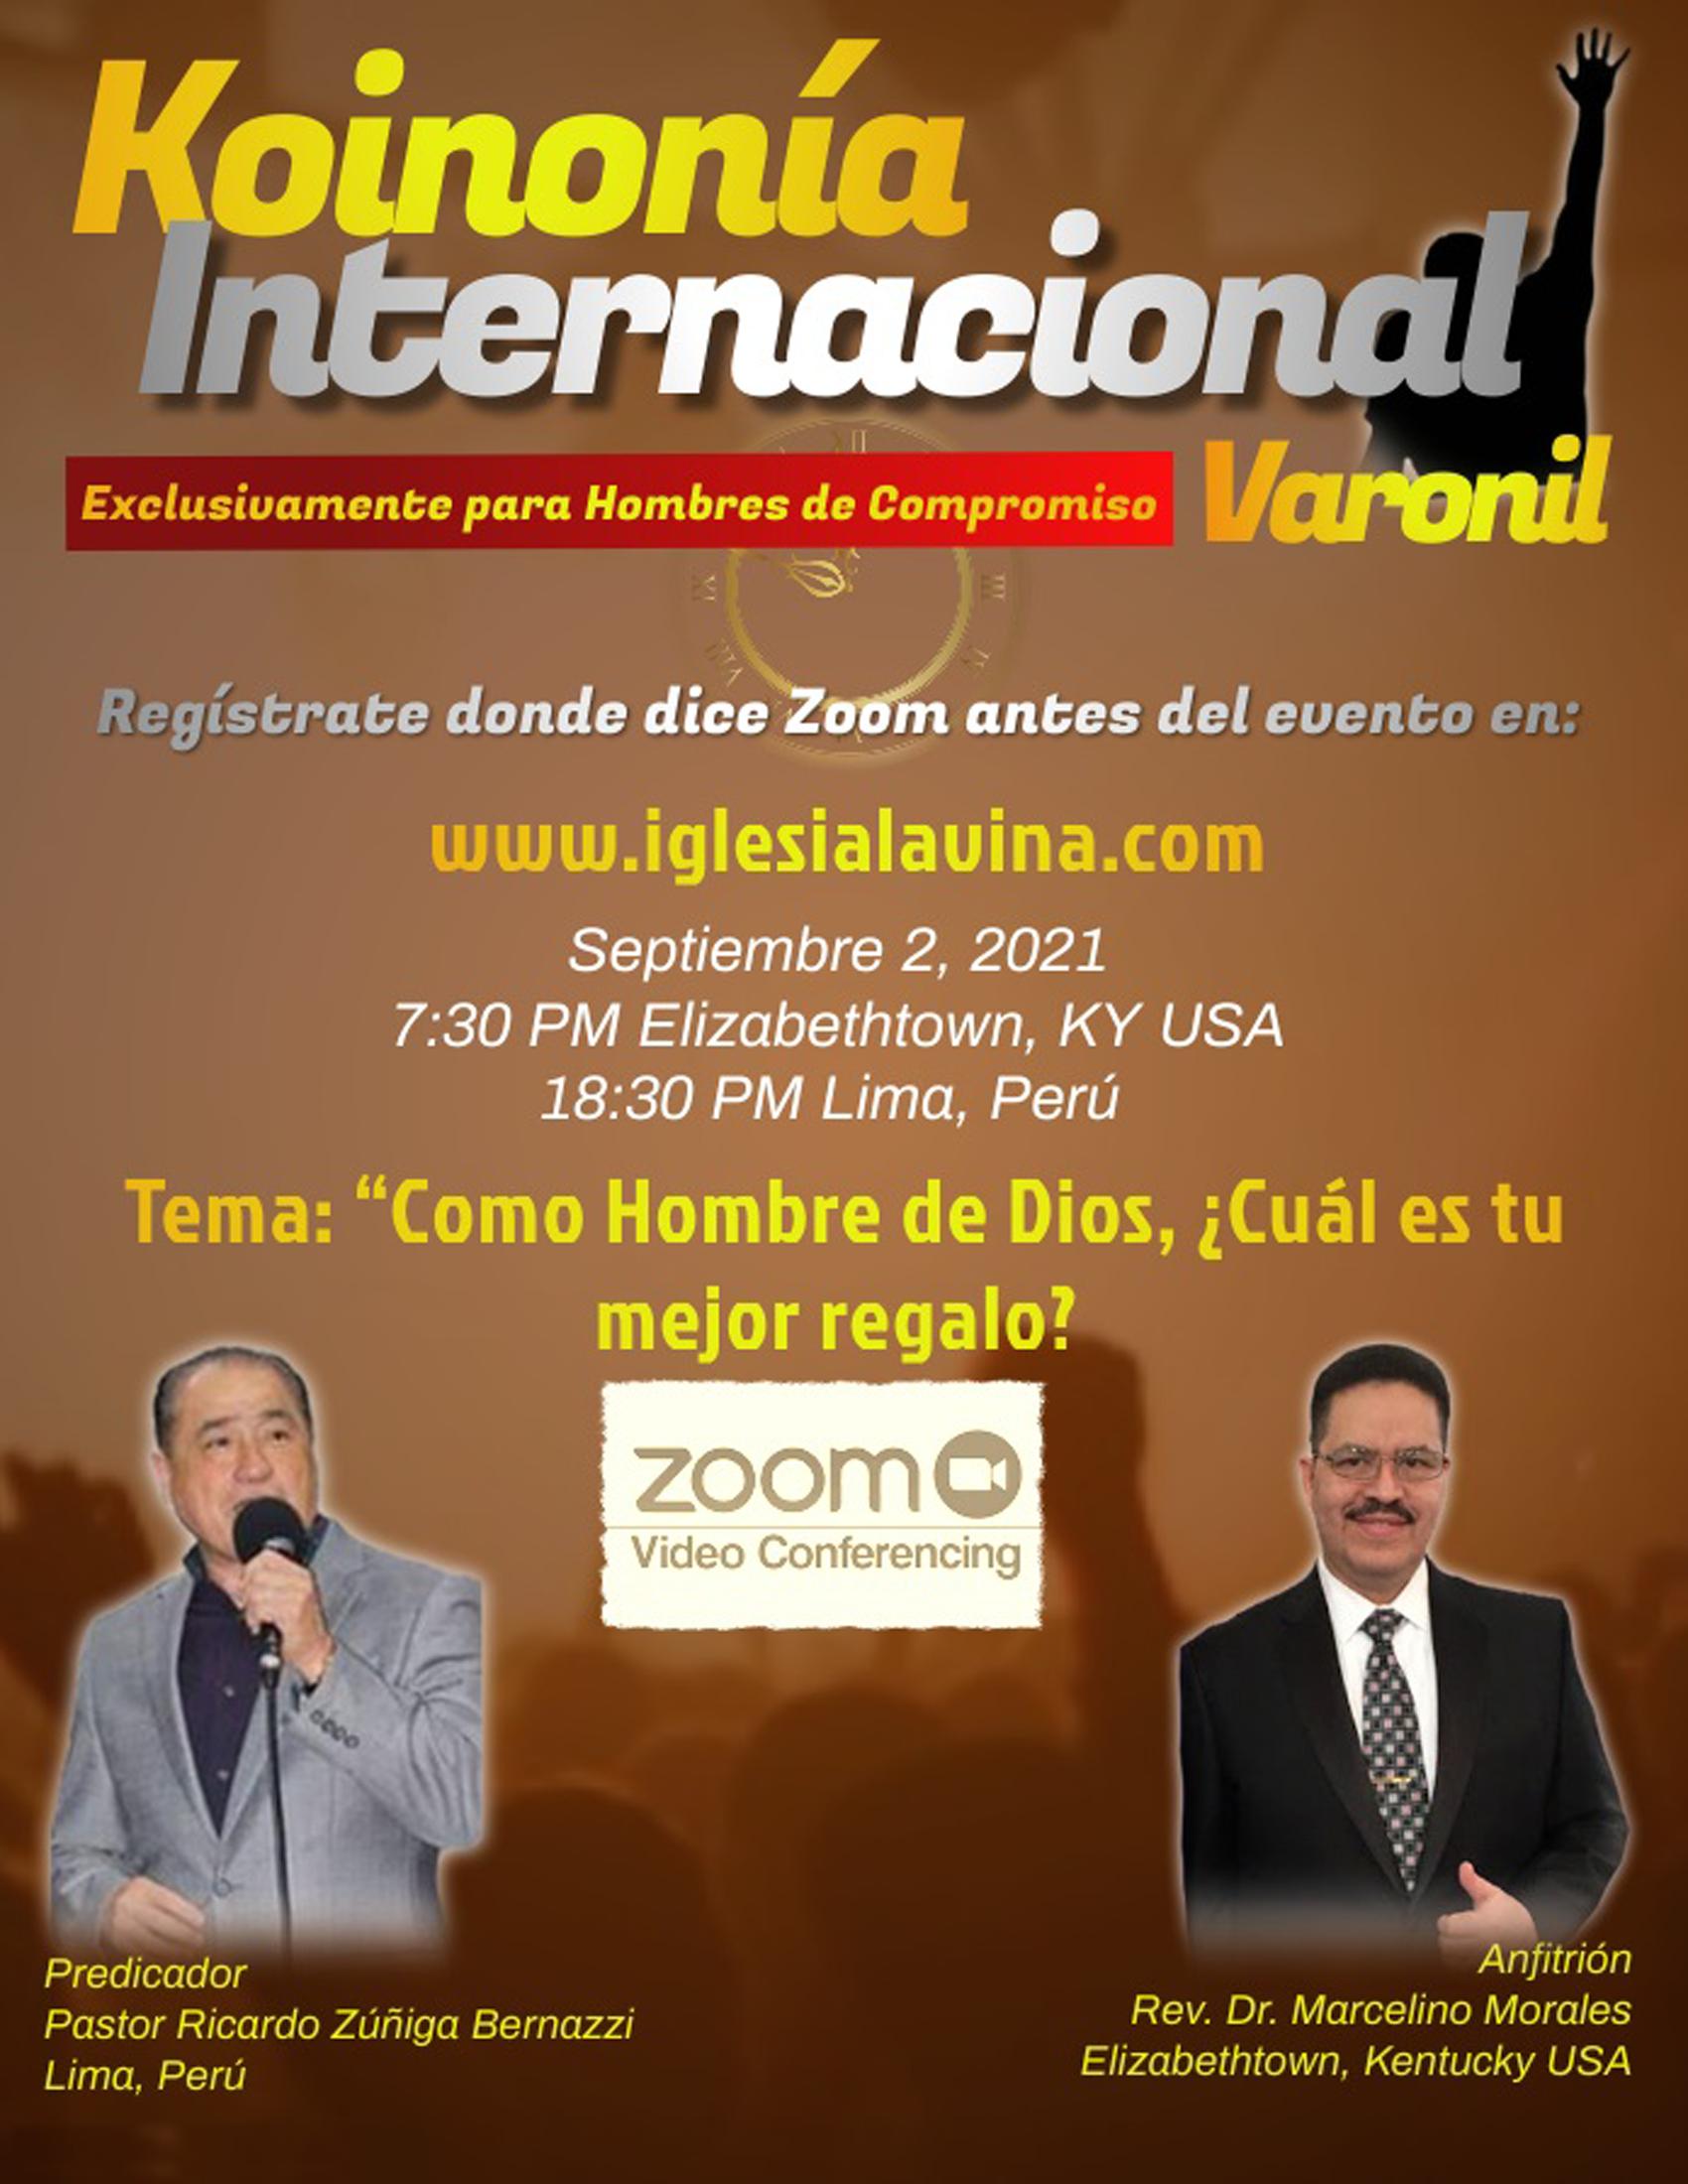 Koinonía 9-2-2021 - Pastor Ricardo Zúñig